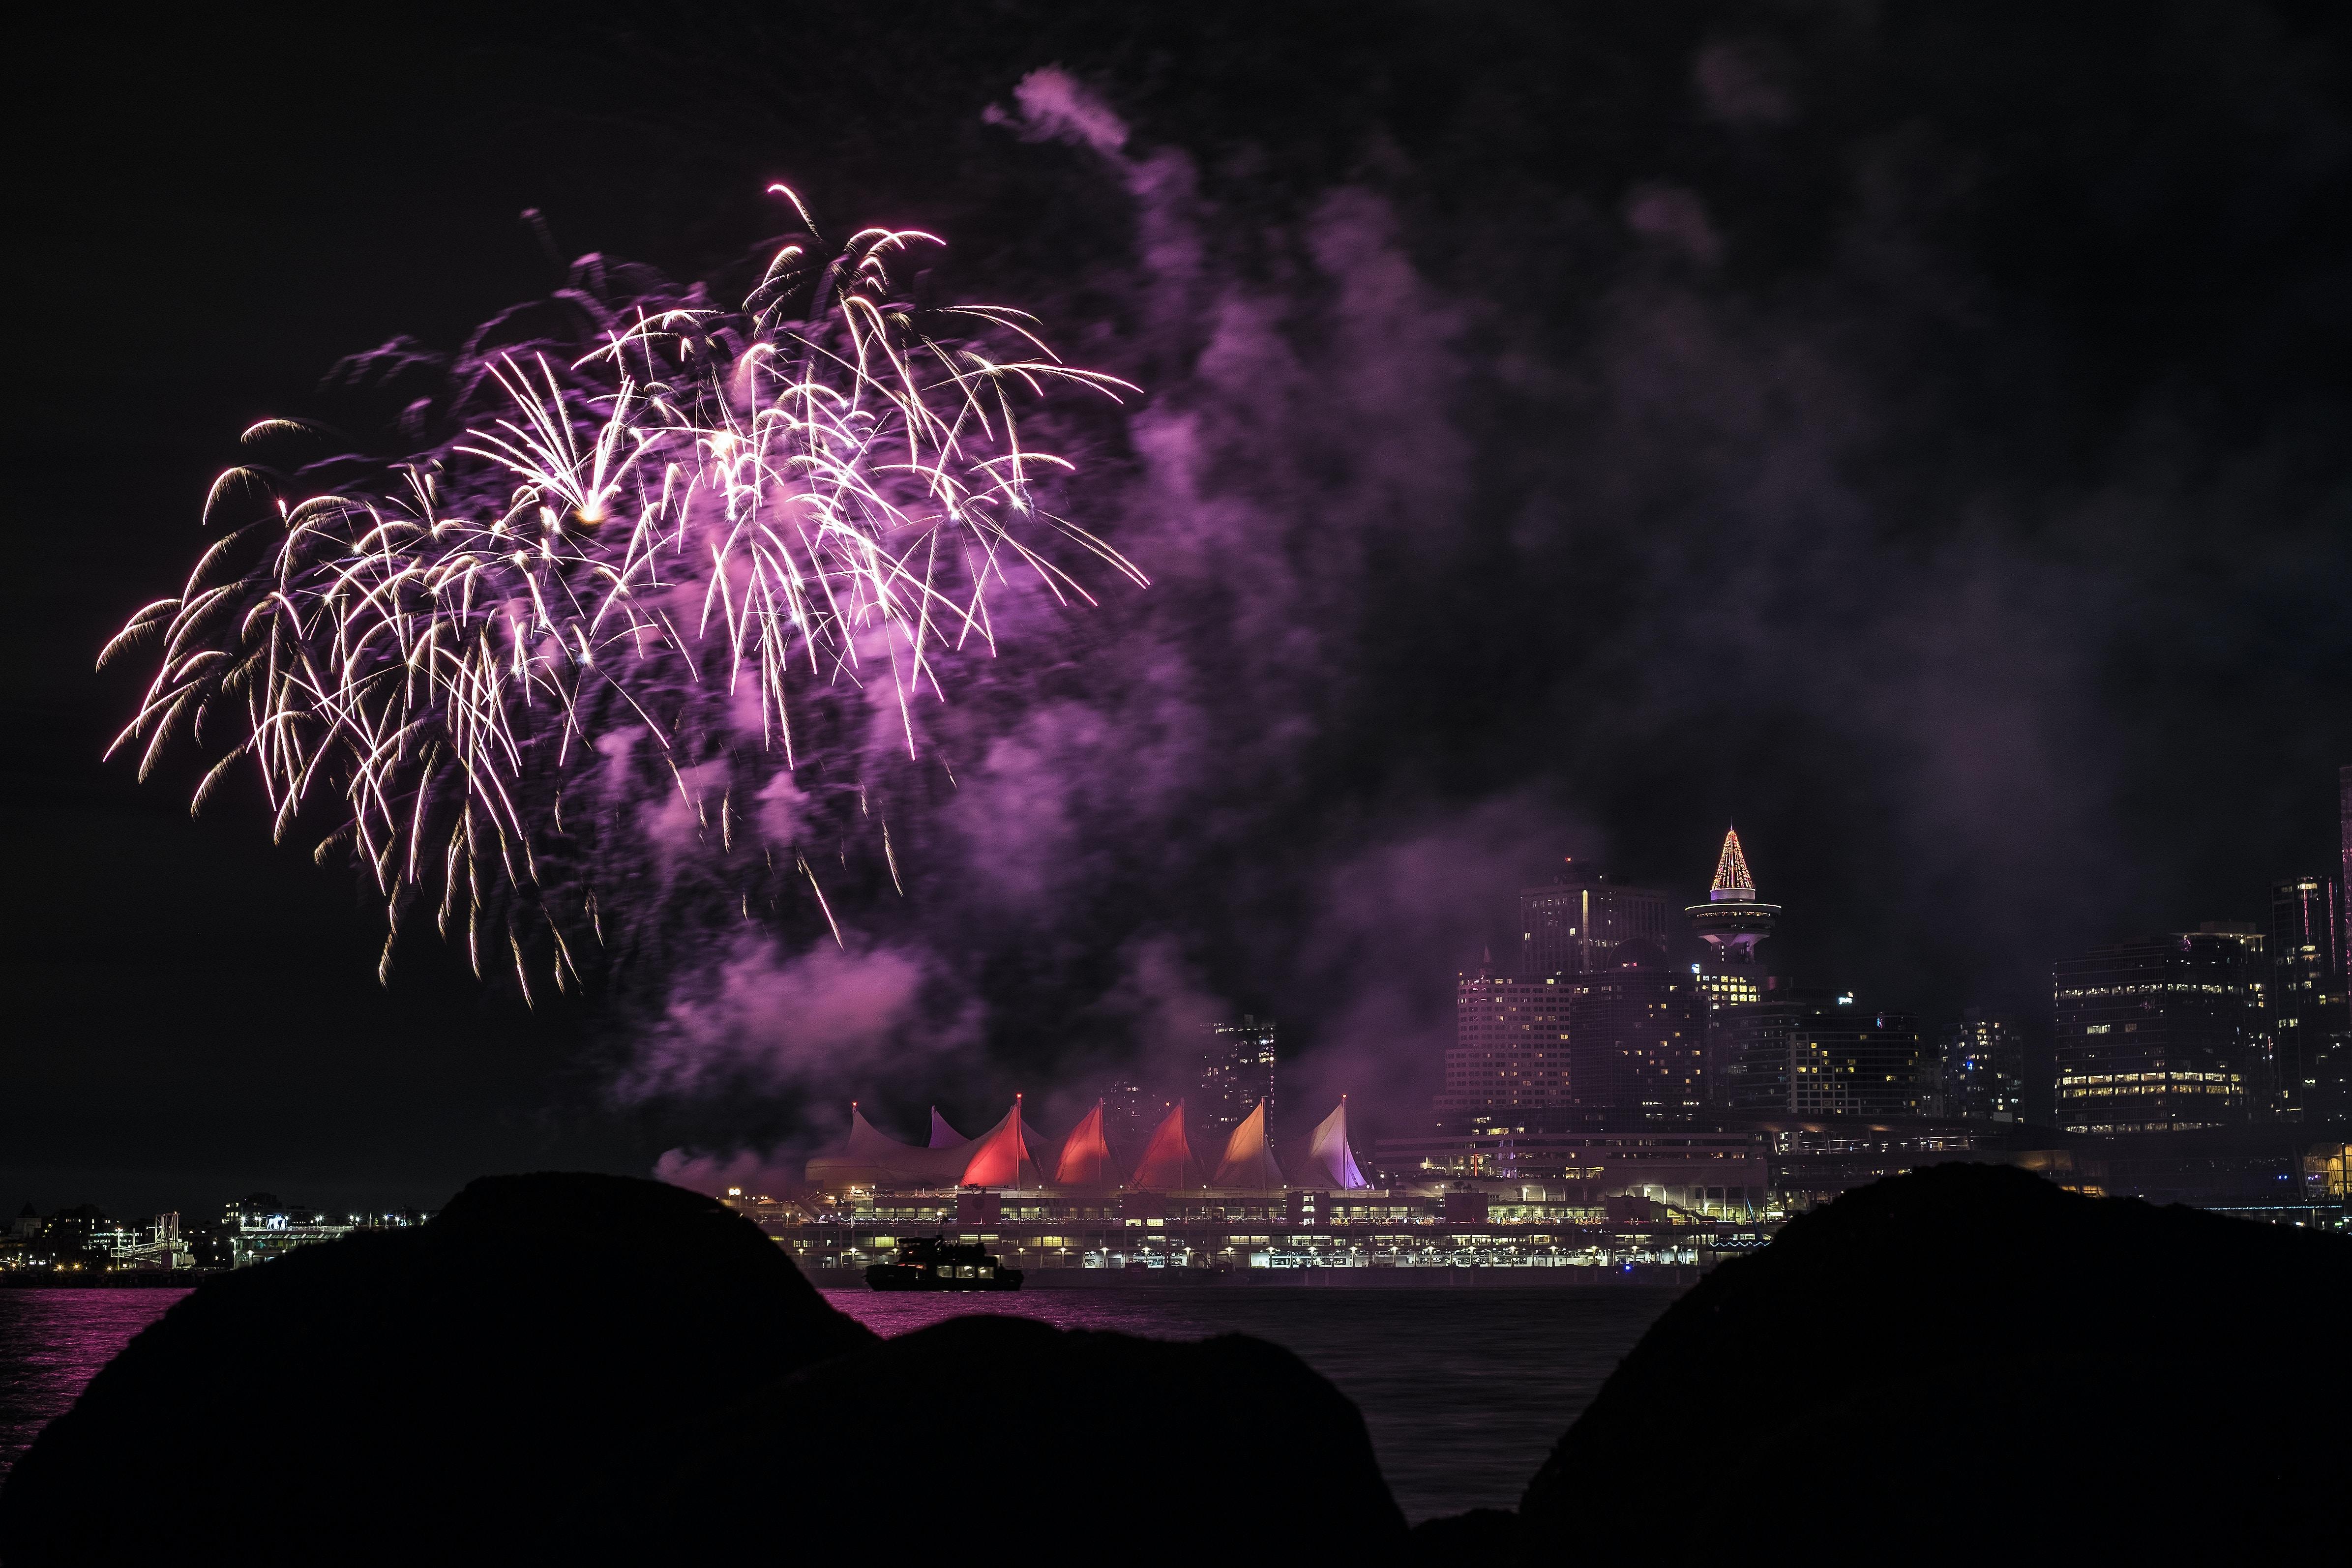 fireworks above city skyline at night-time